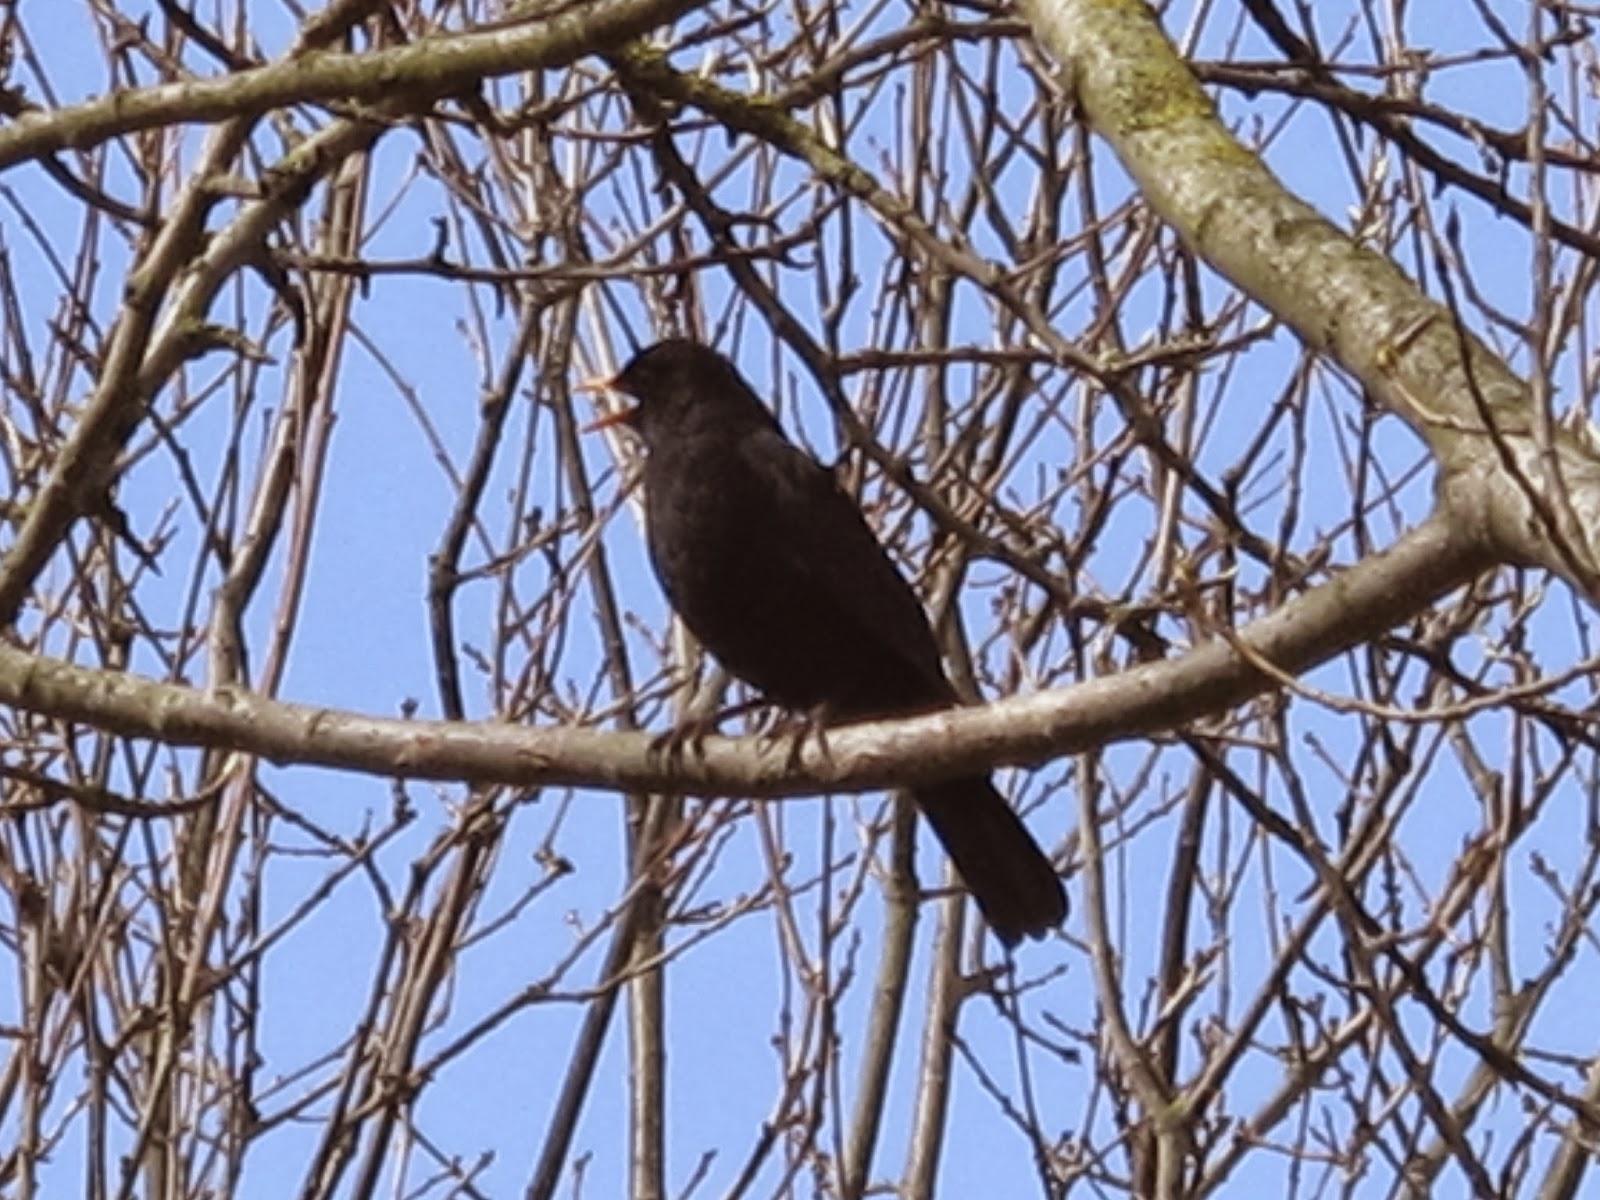 The Rattling Crow: Blackbird alarm calls